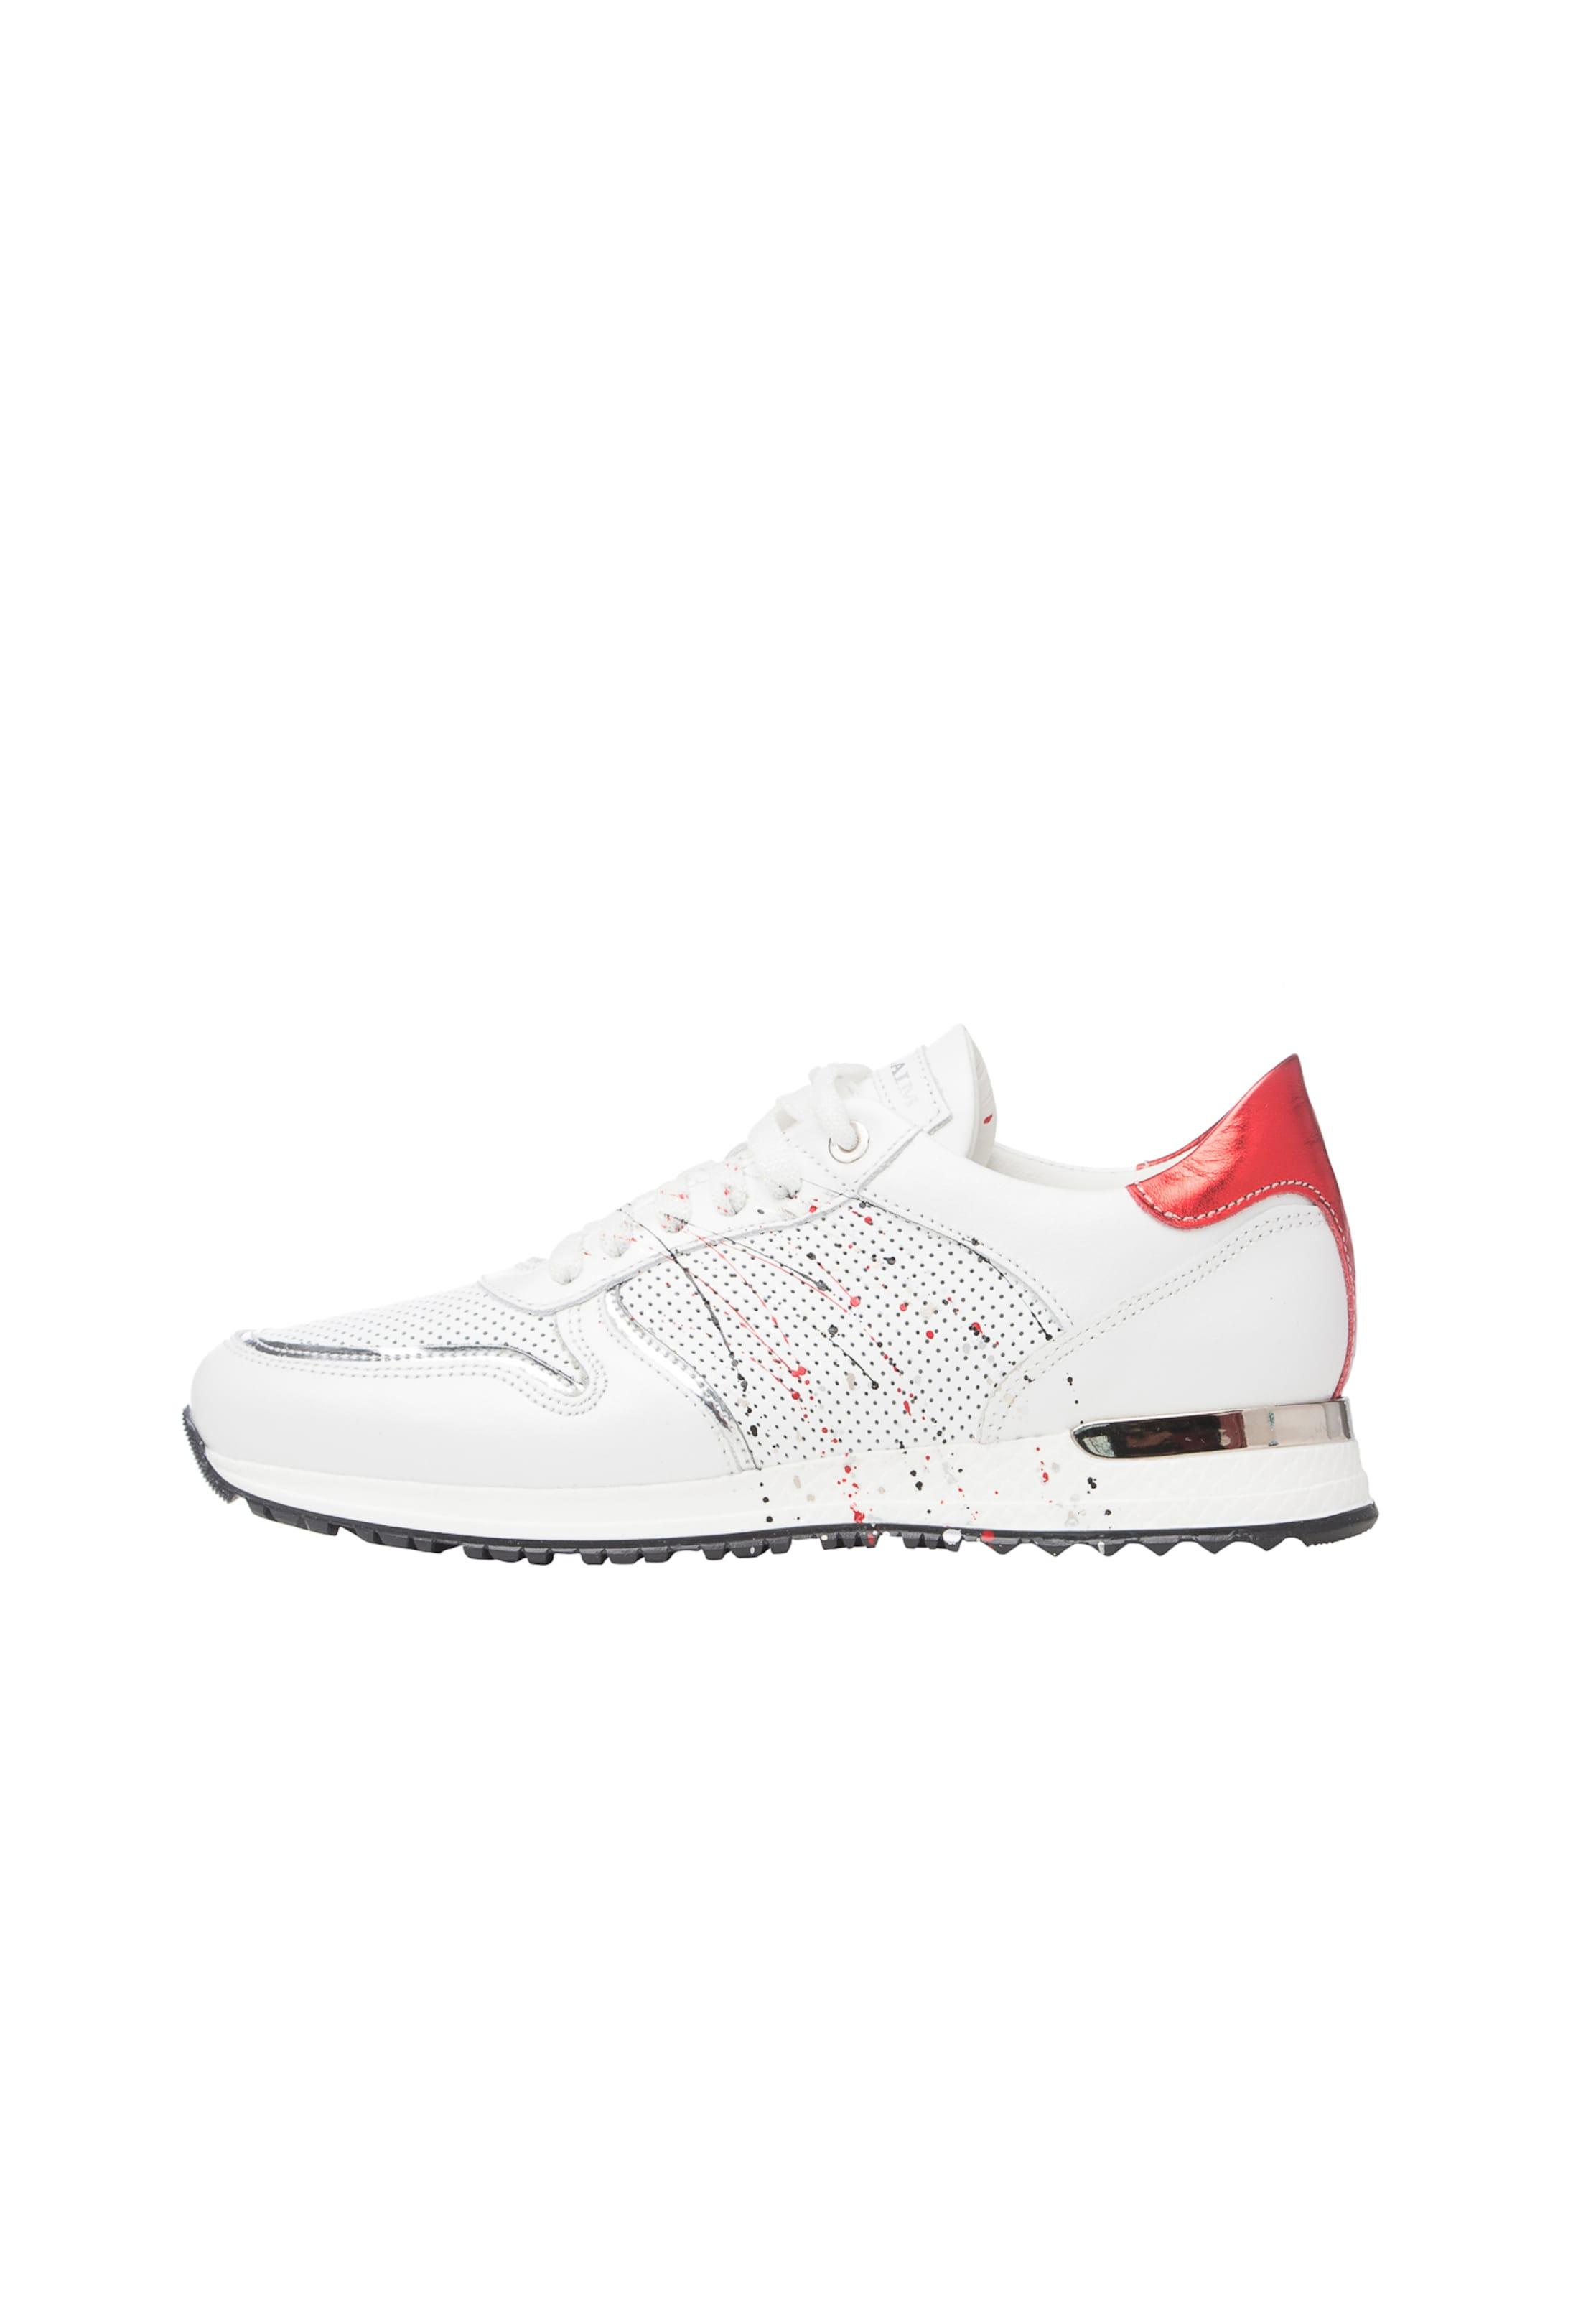 61p' In RotSchwarz Sneaker 'agata Weiß Noclaim E2DYWI9H